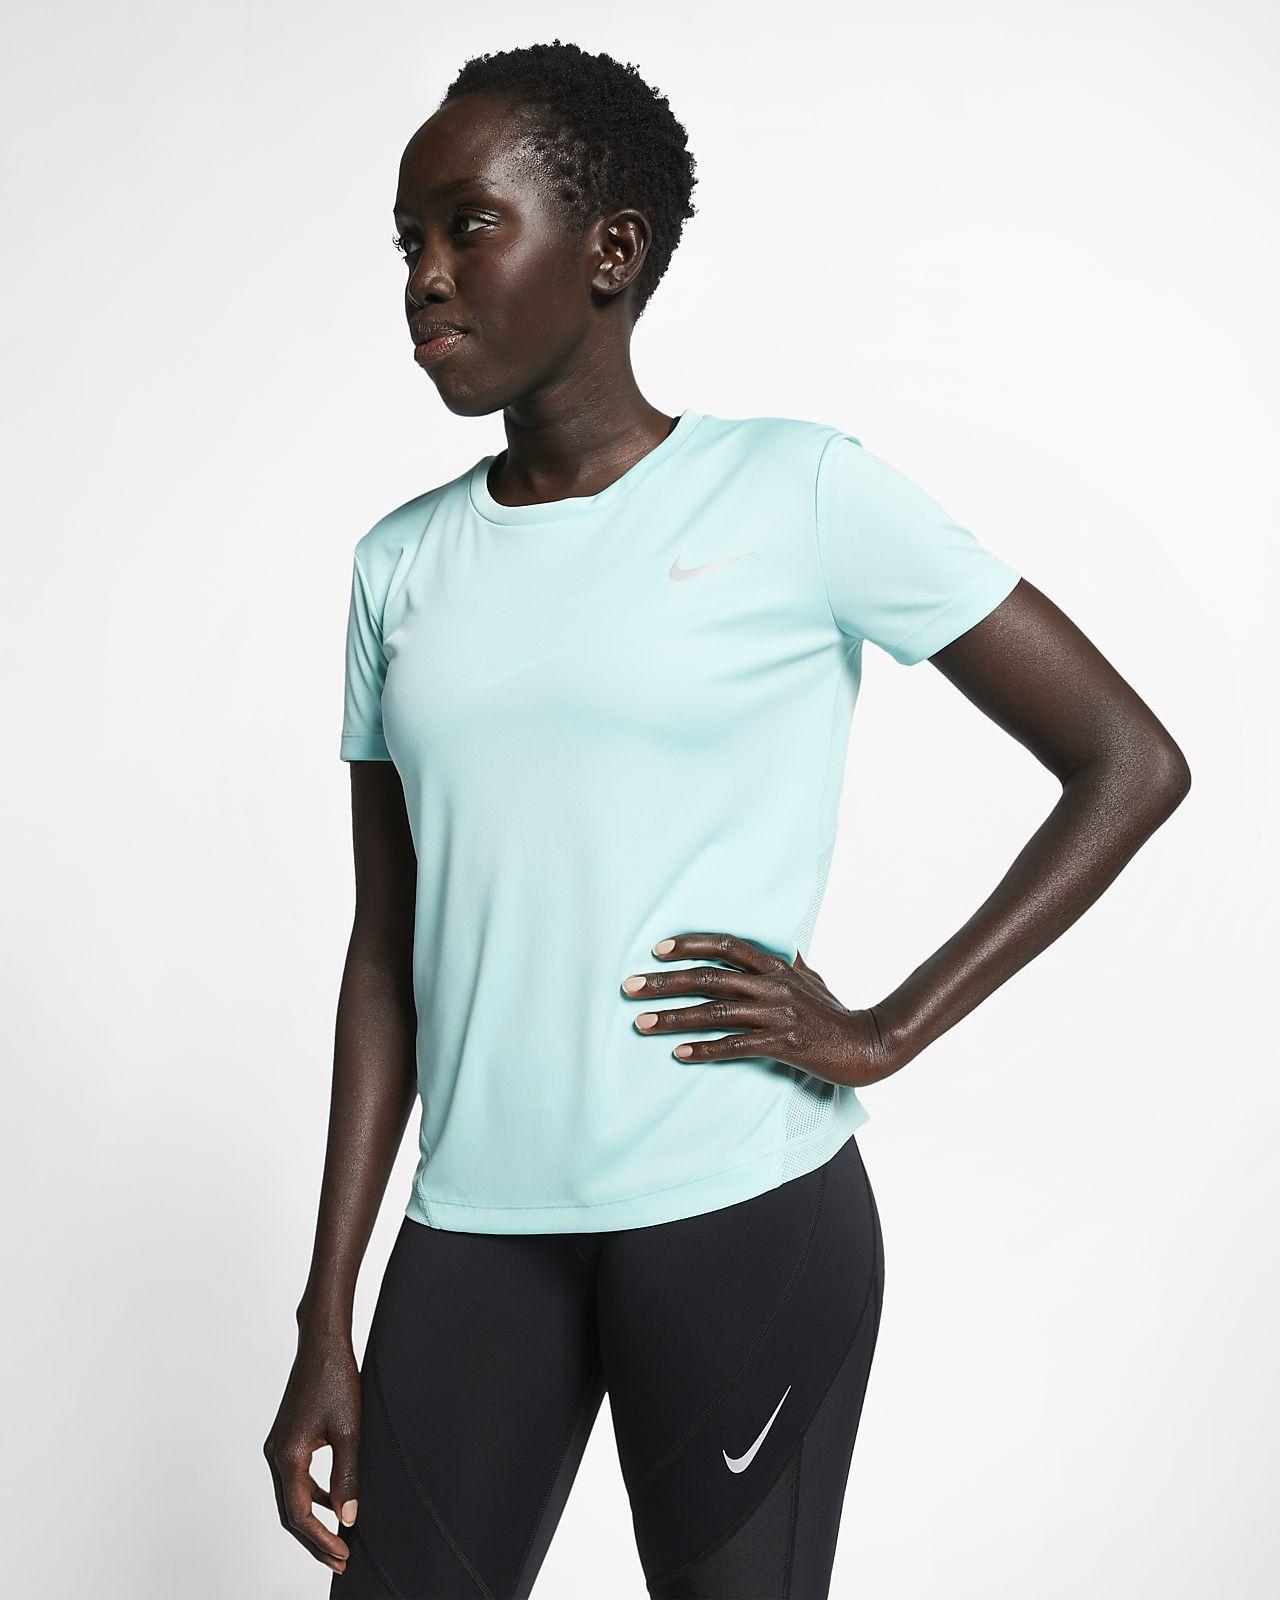 official photos 58d6c 253ab ... Nike Miler Women s Short-Sleeve Running Top